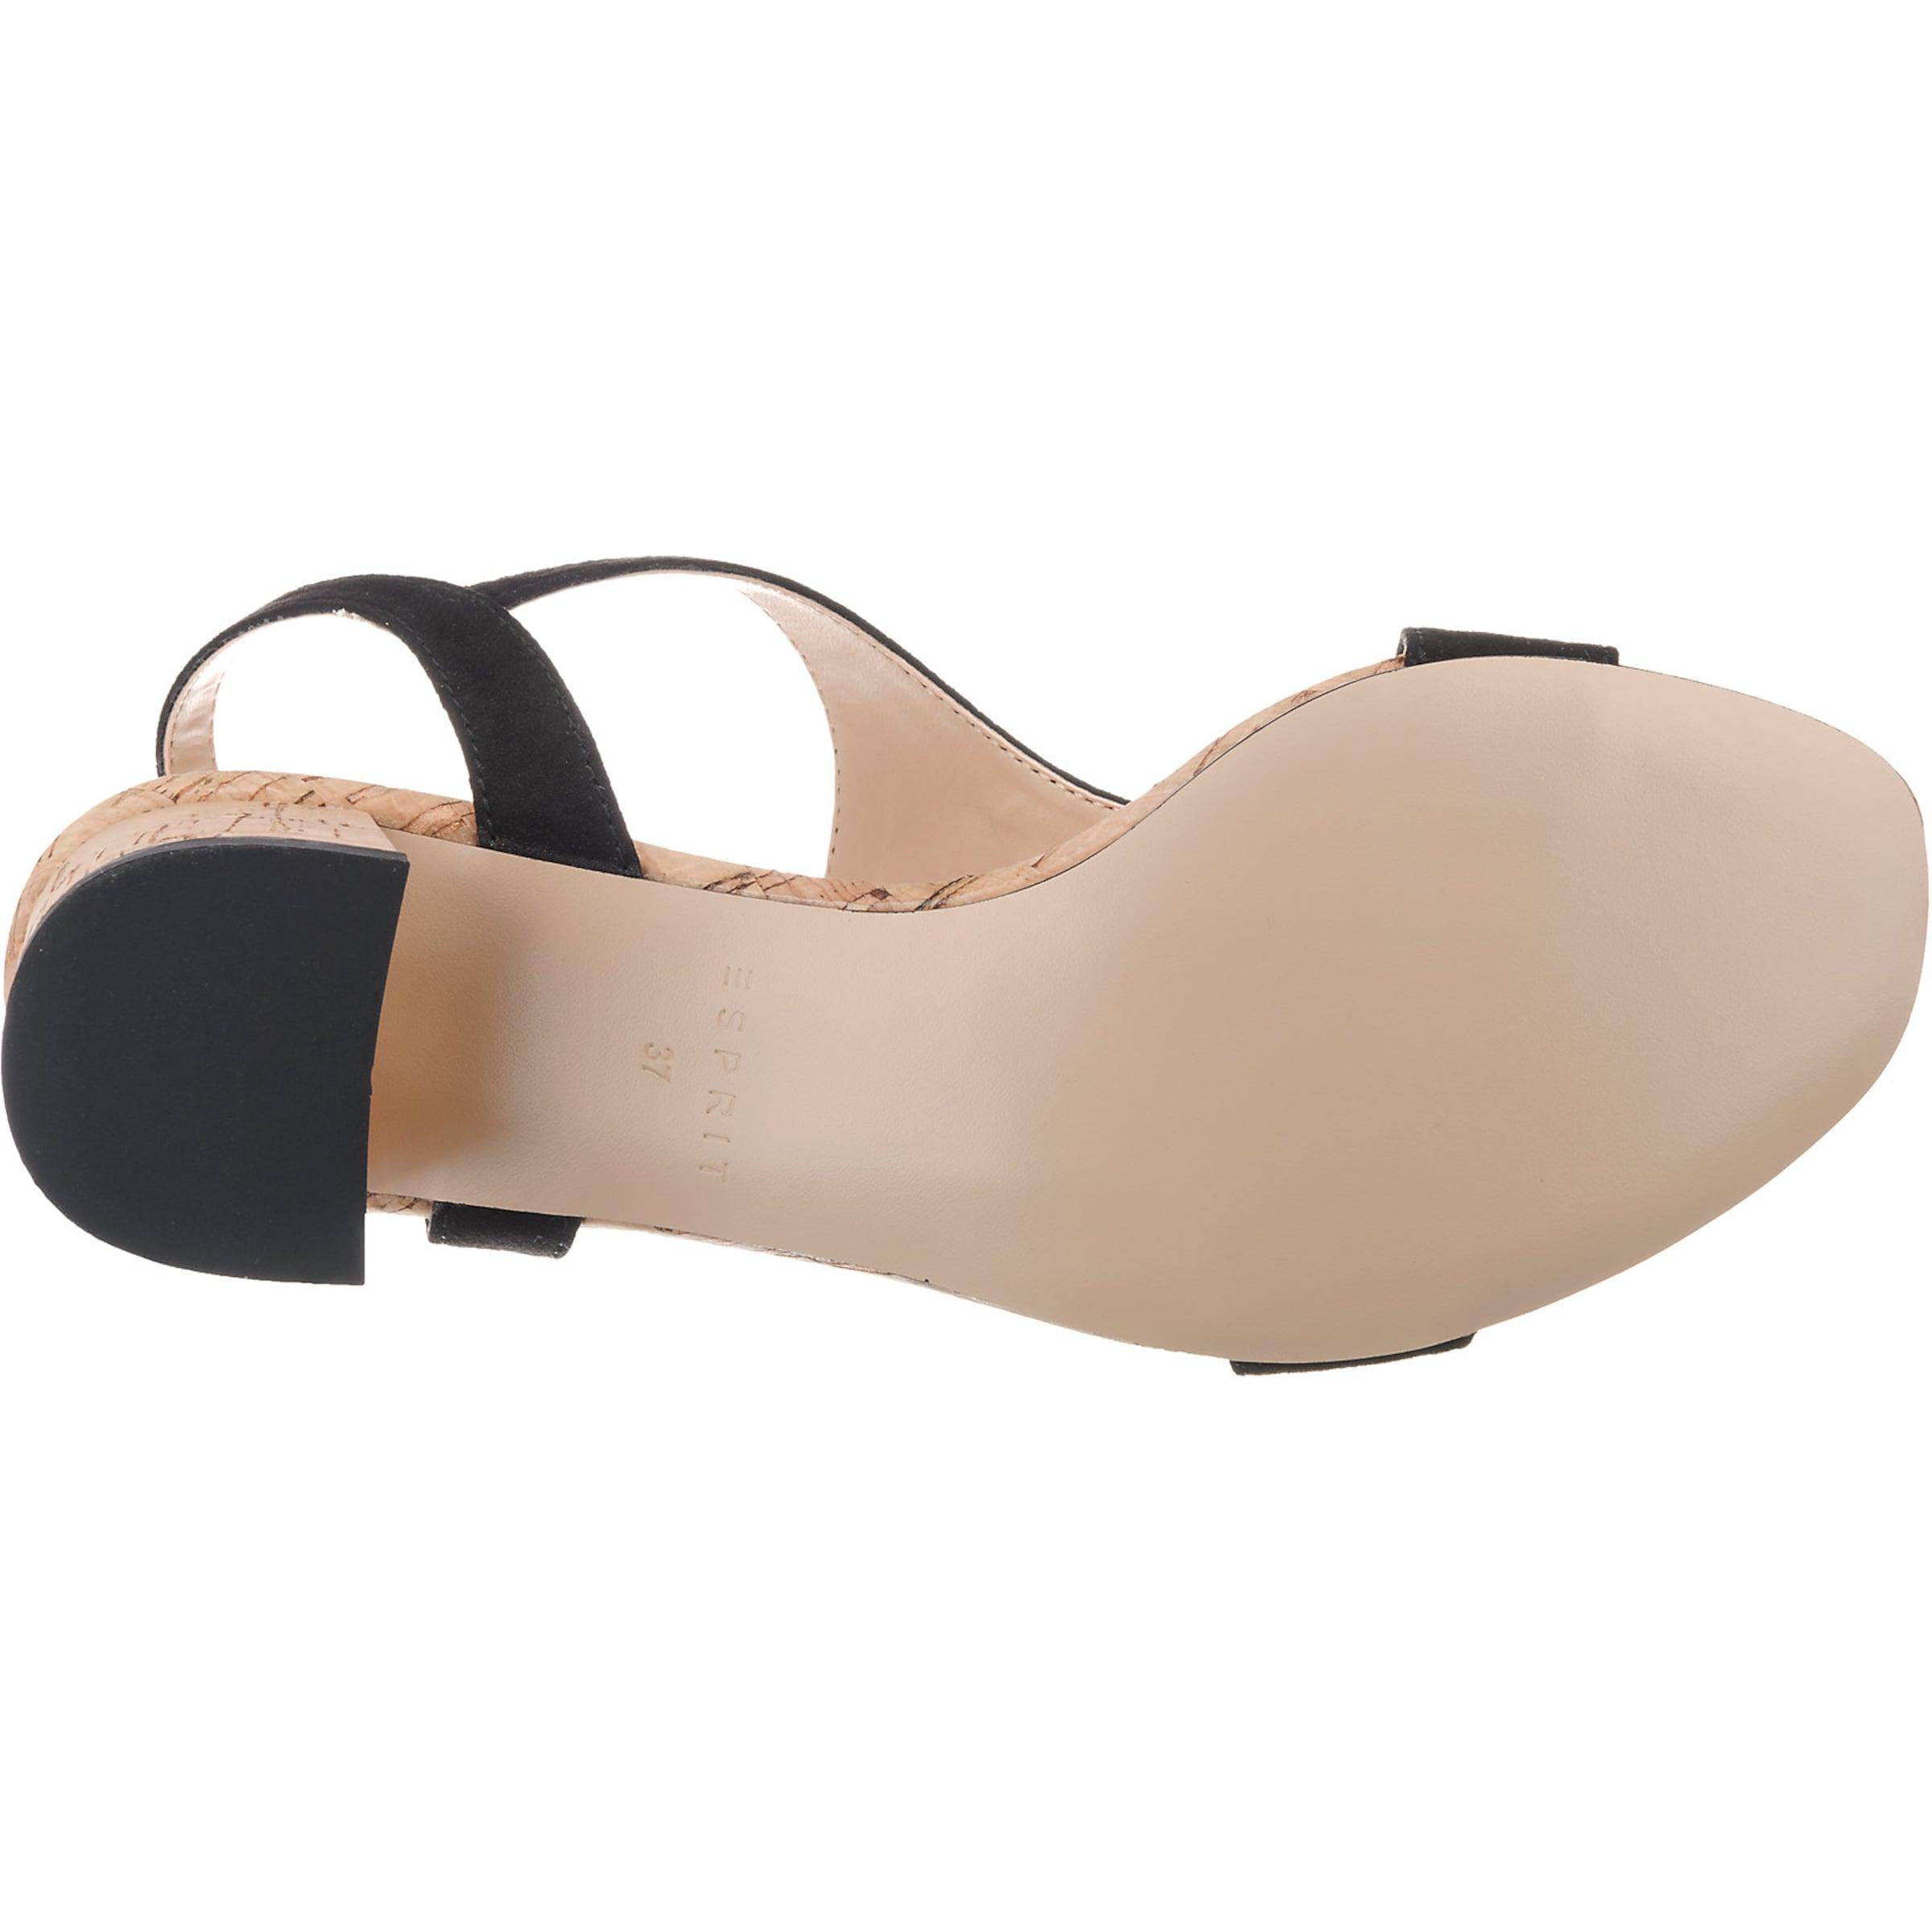 In Sandals 'doris Rcxtshqd Sandal' Nero Esprit mOvn80wN